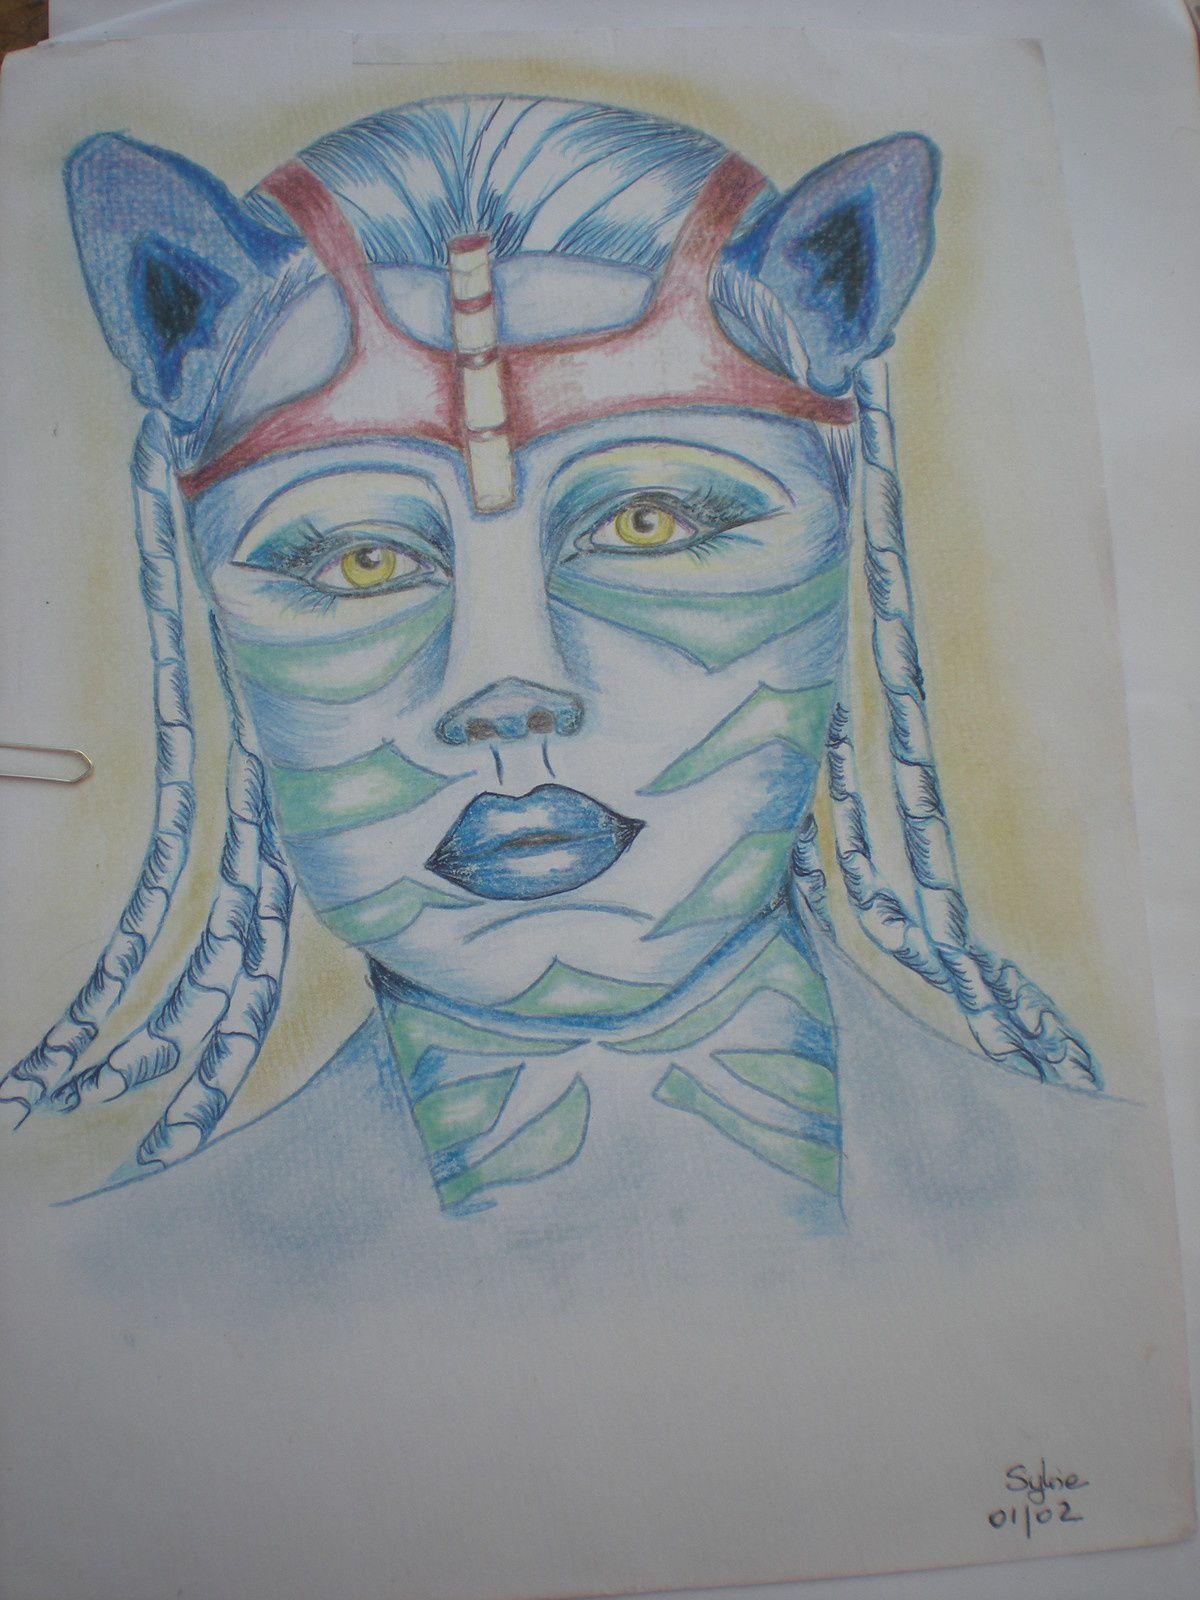 Apprendre à dessiner, à peindre